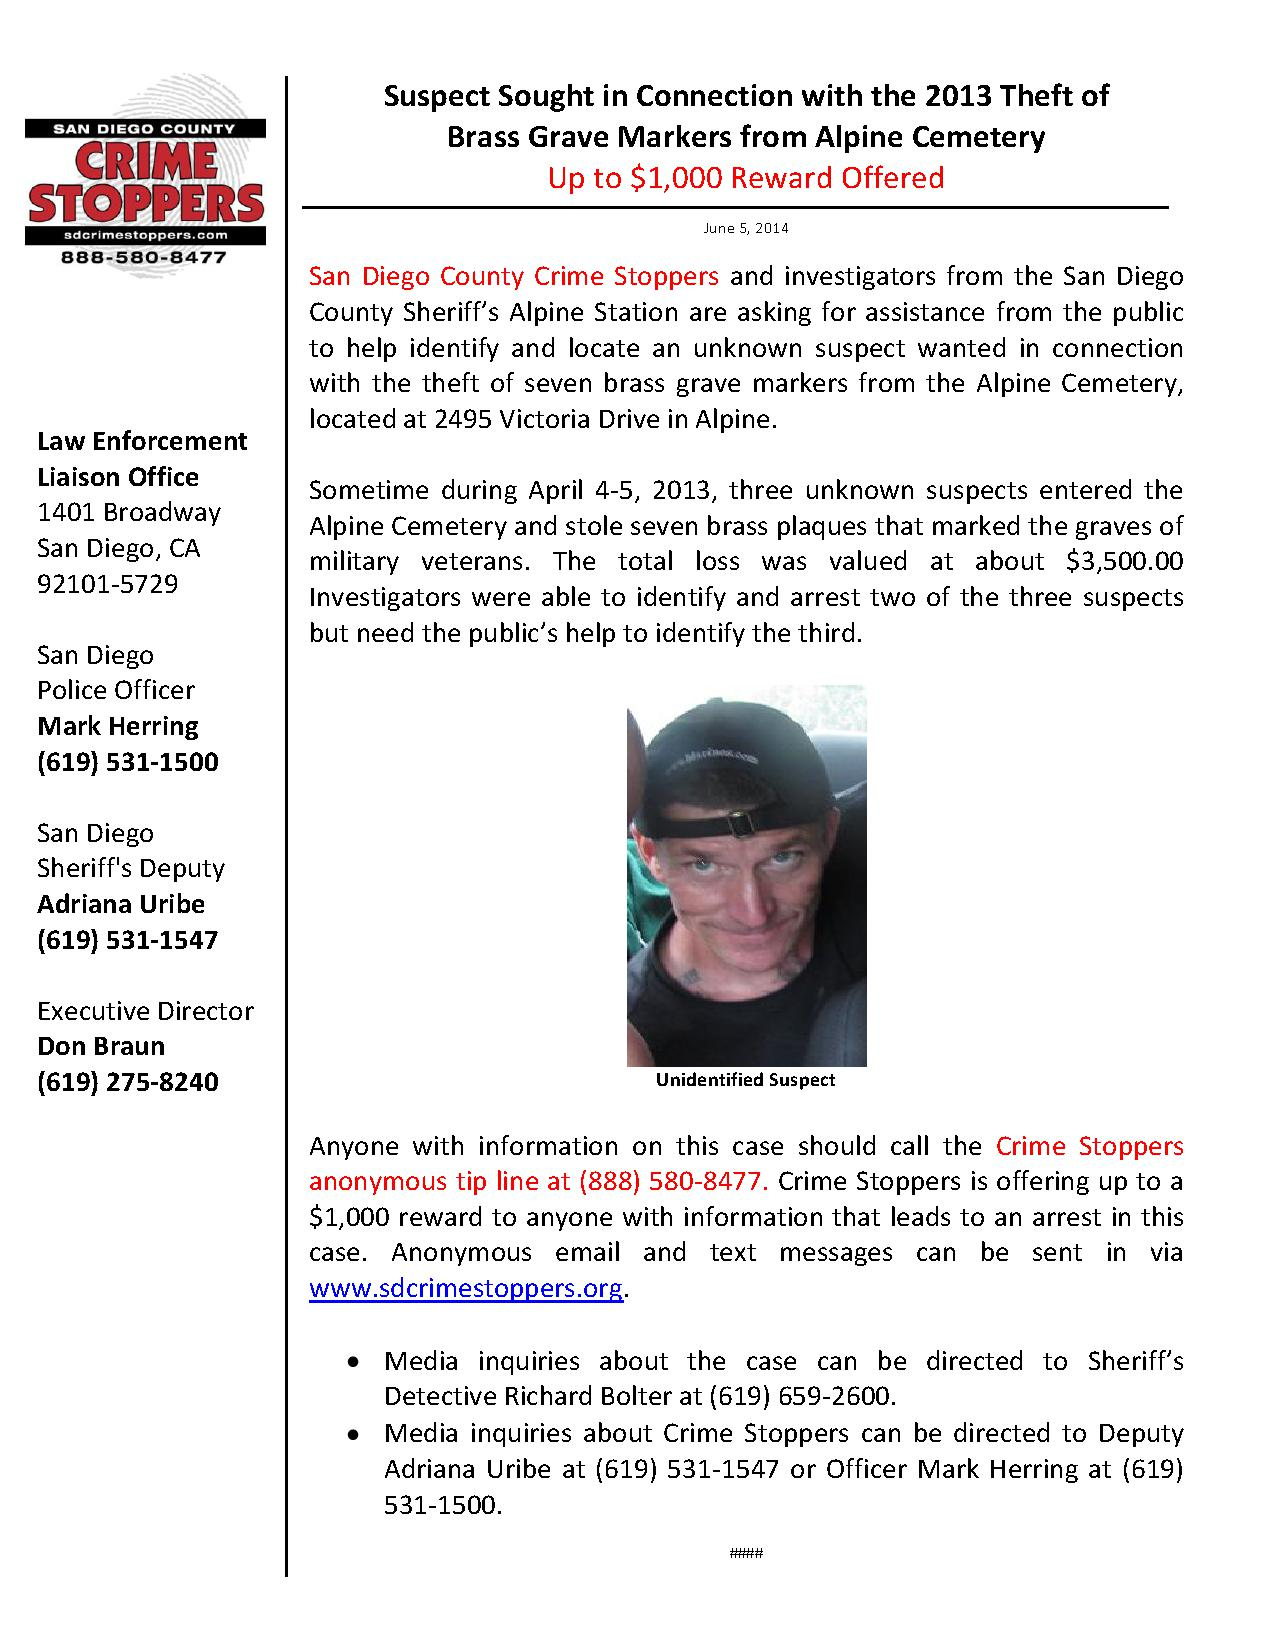 060514 Brass Marker Thefts_1